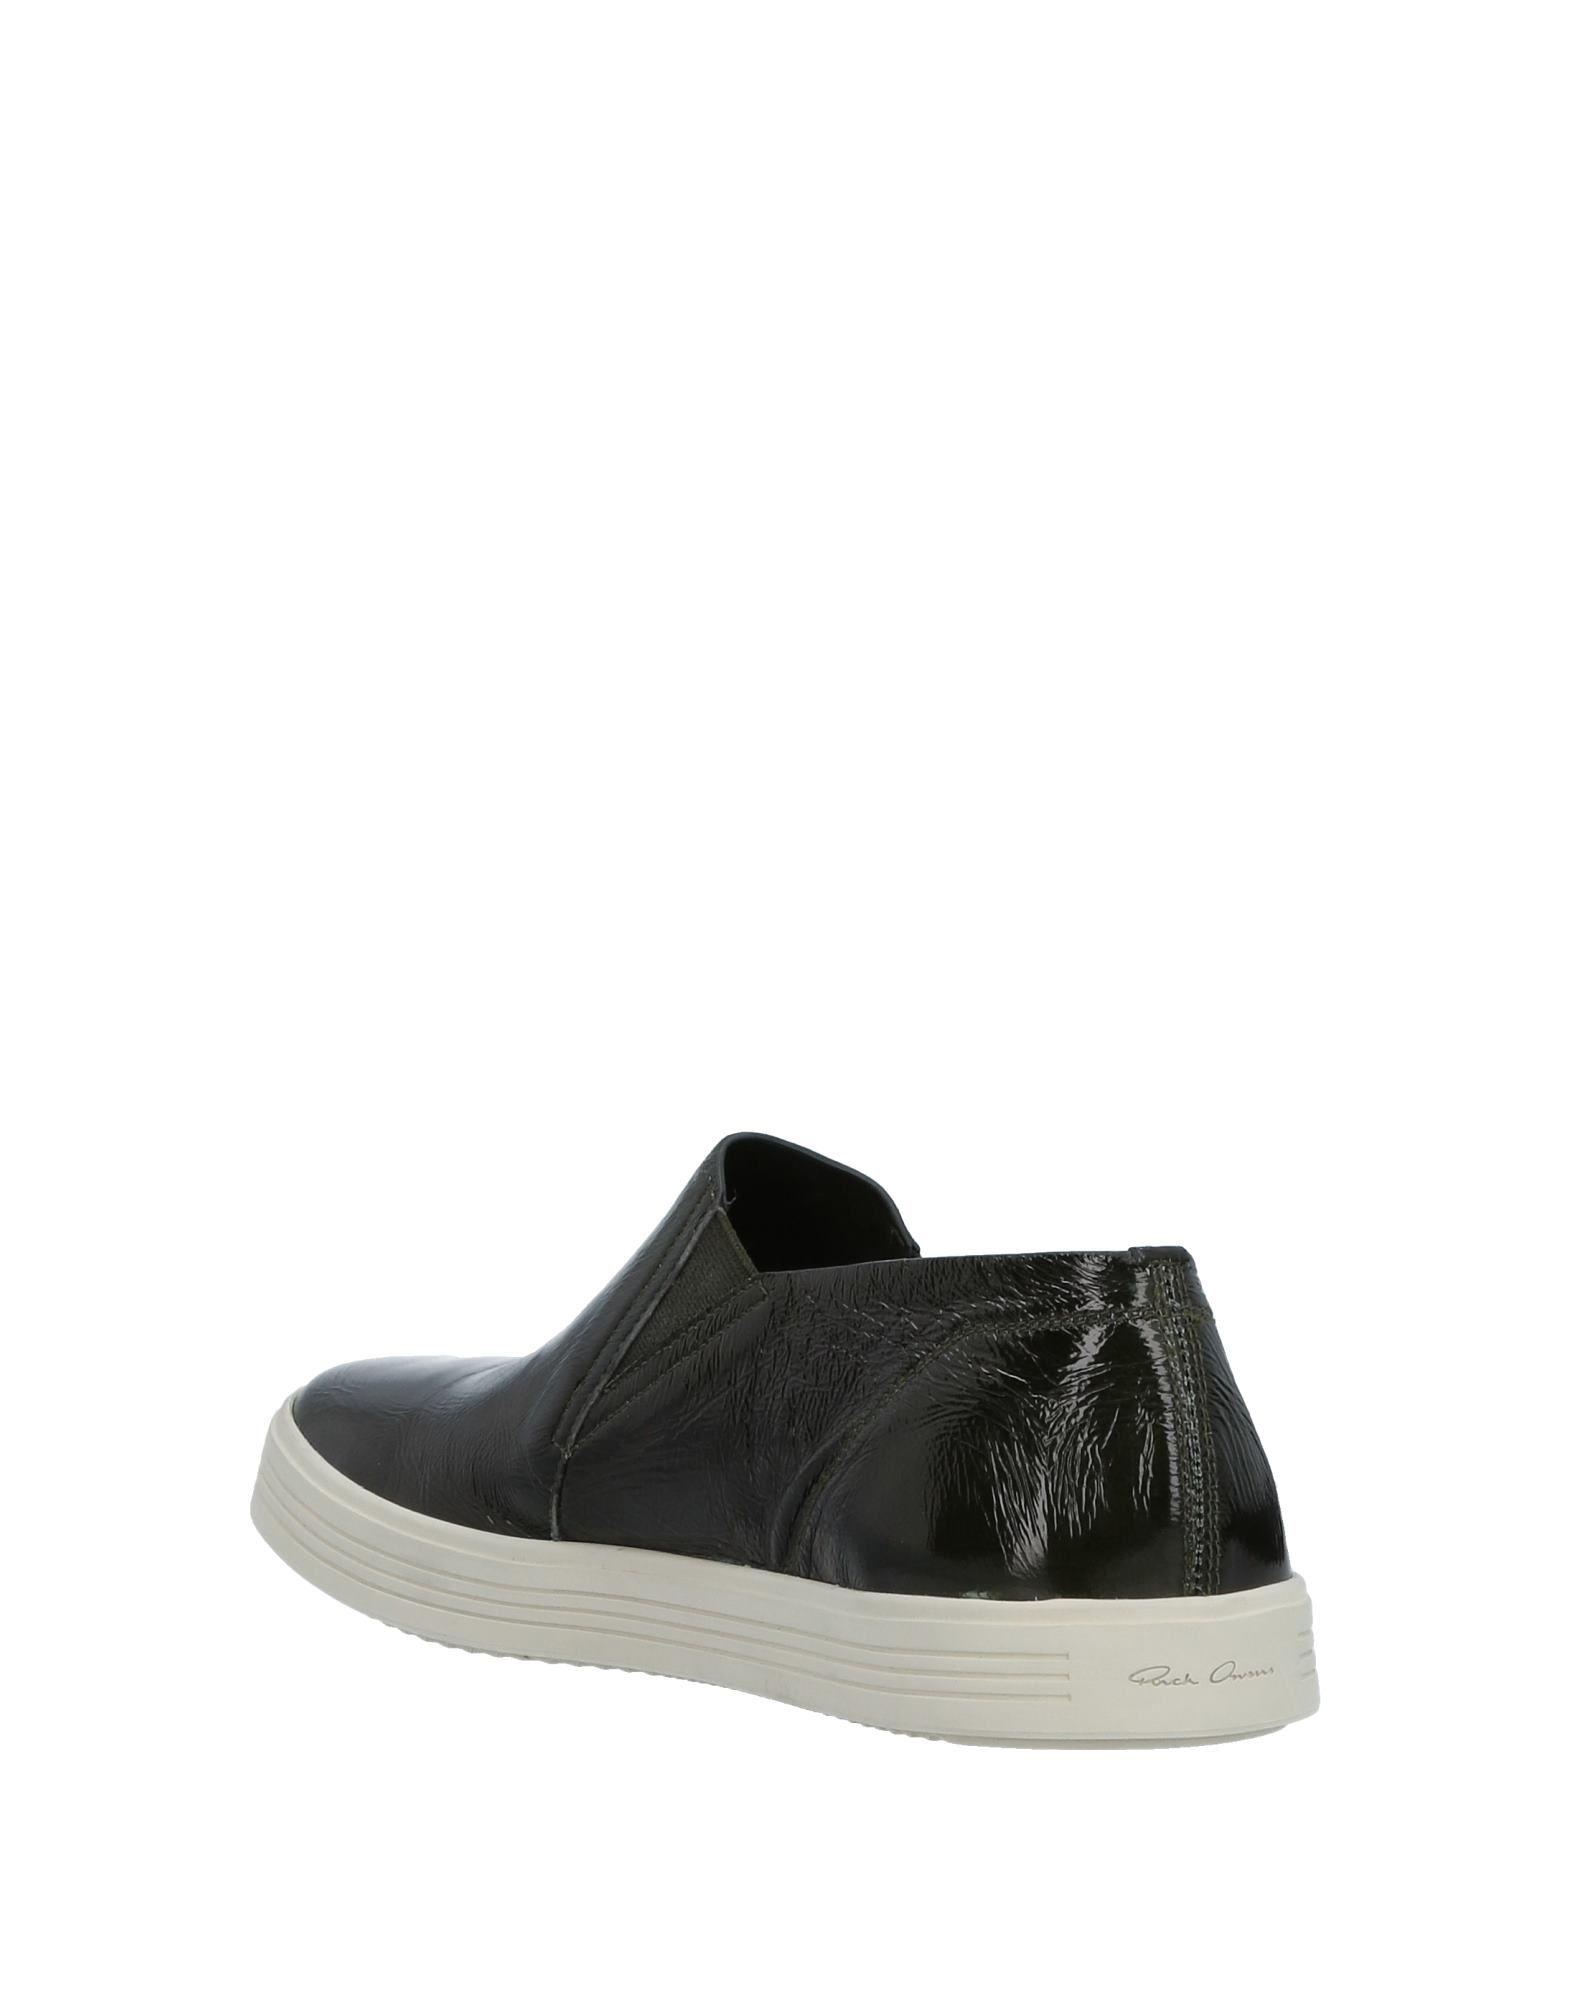 Rick Owens Owens Rick Sneakers Herren  11519927JB Neue Schuhe 4a6339